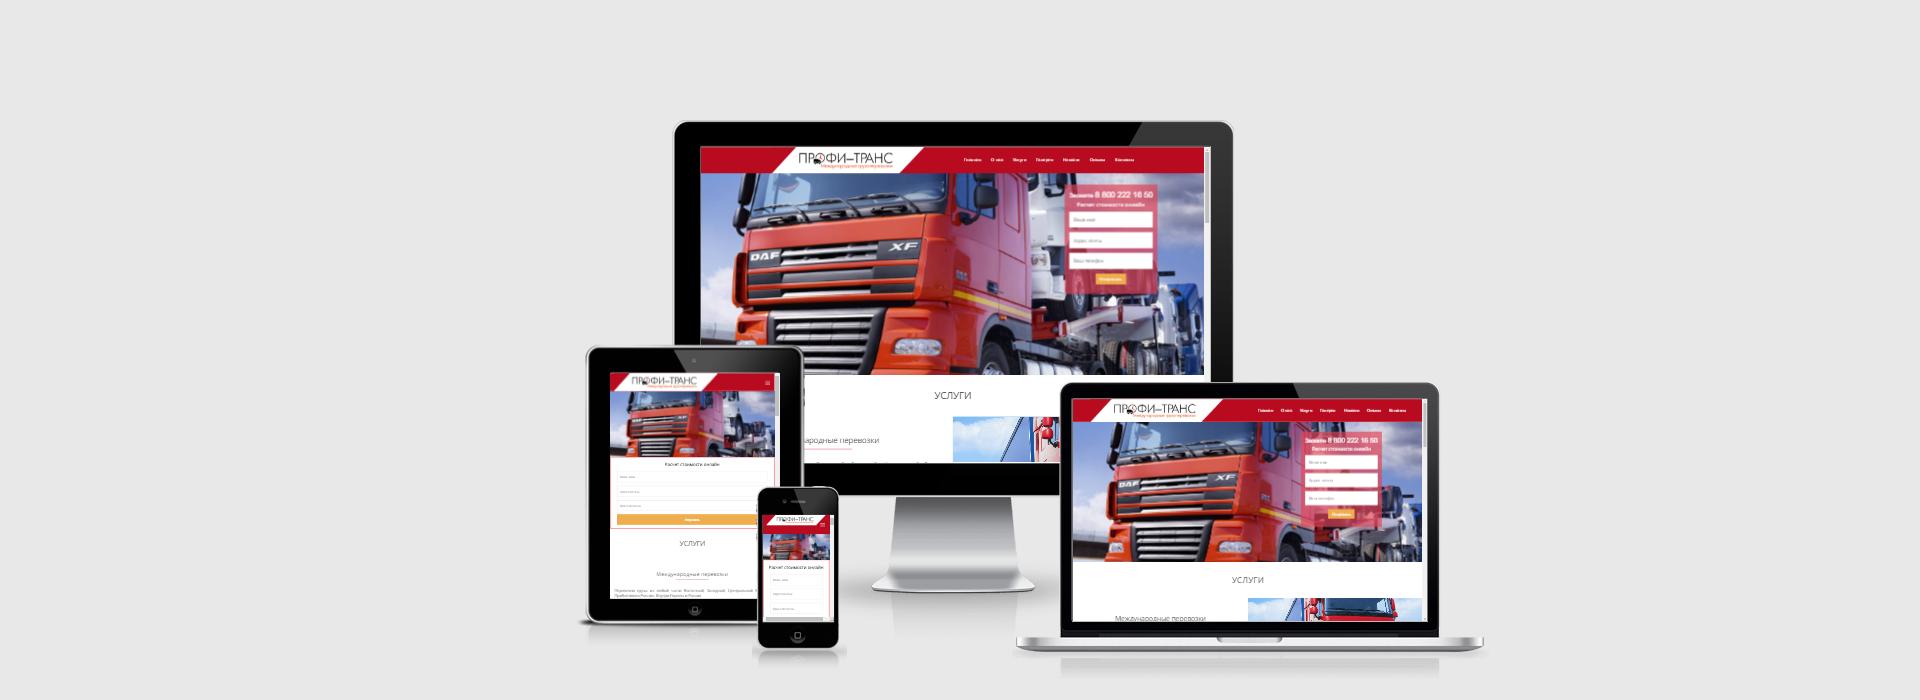 Сайт компании грузоперевозок Профи-Транс